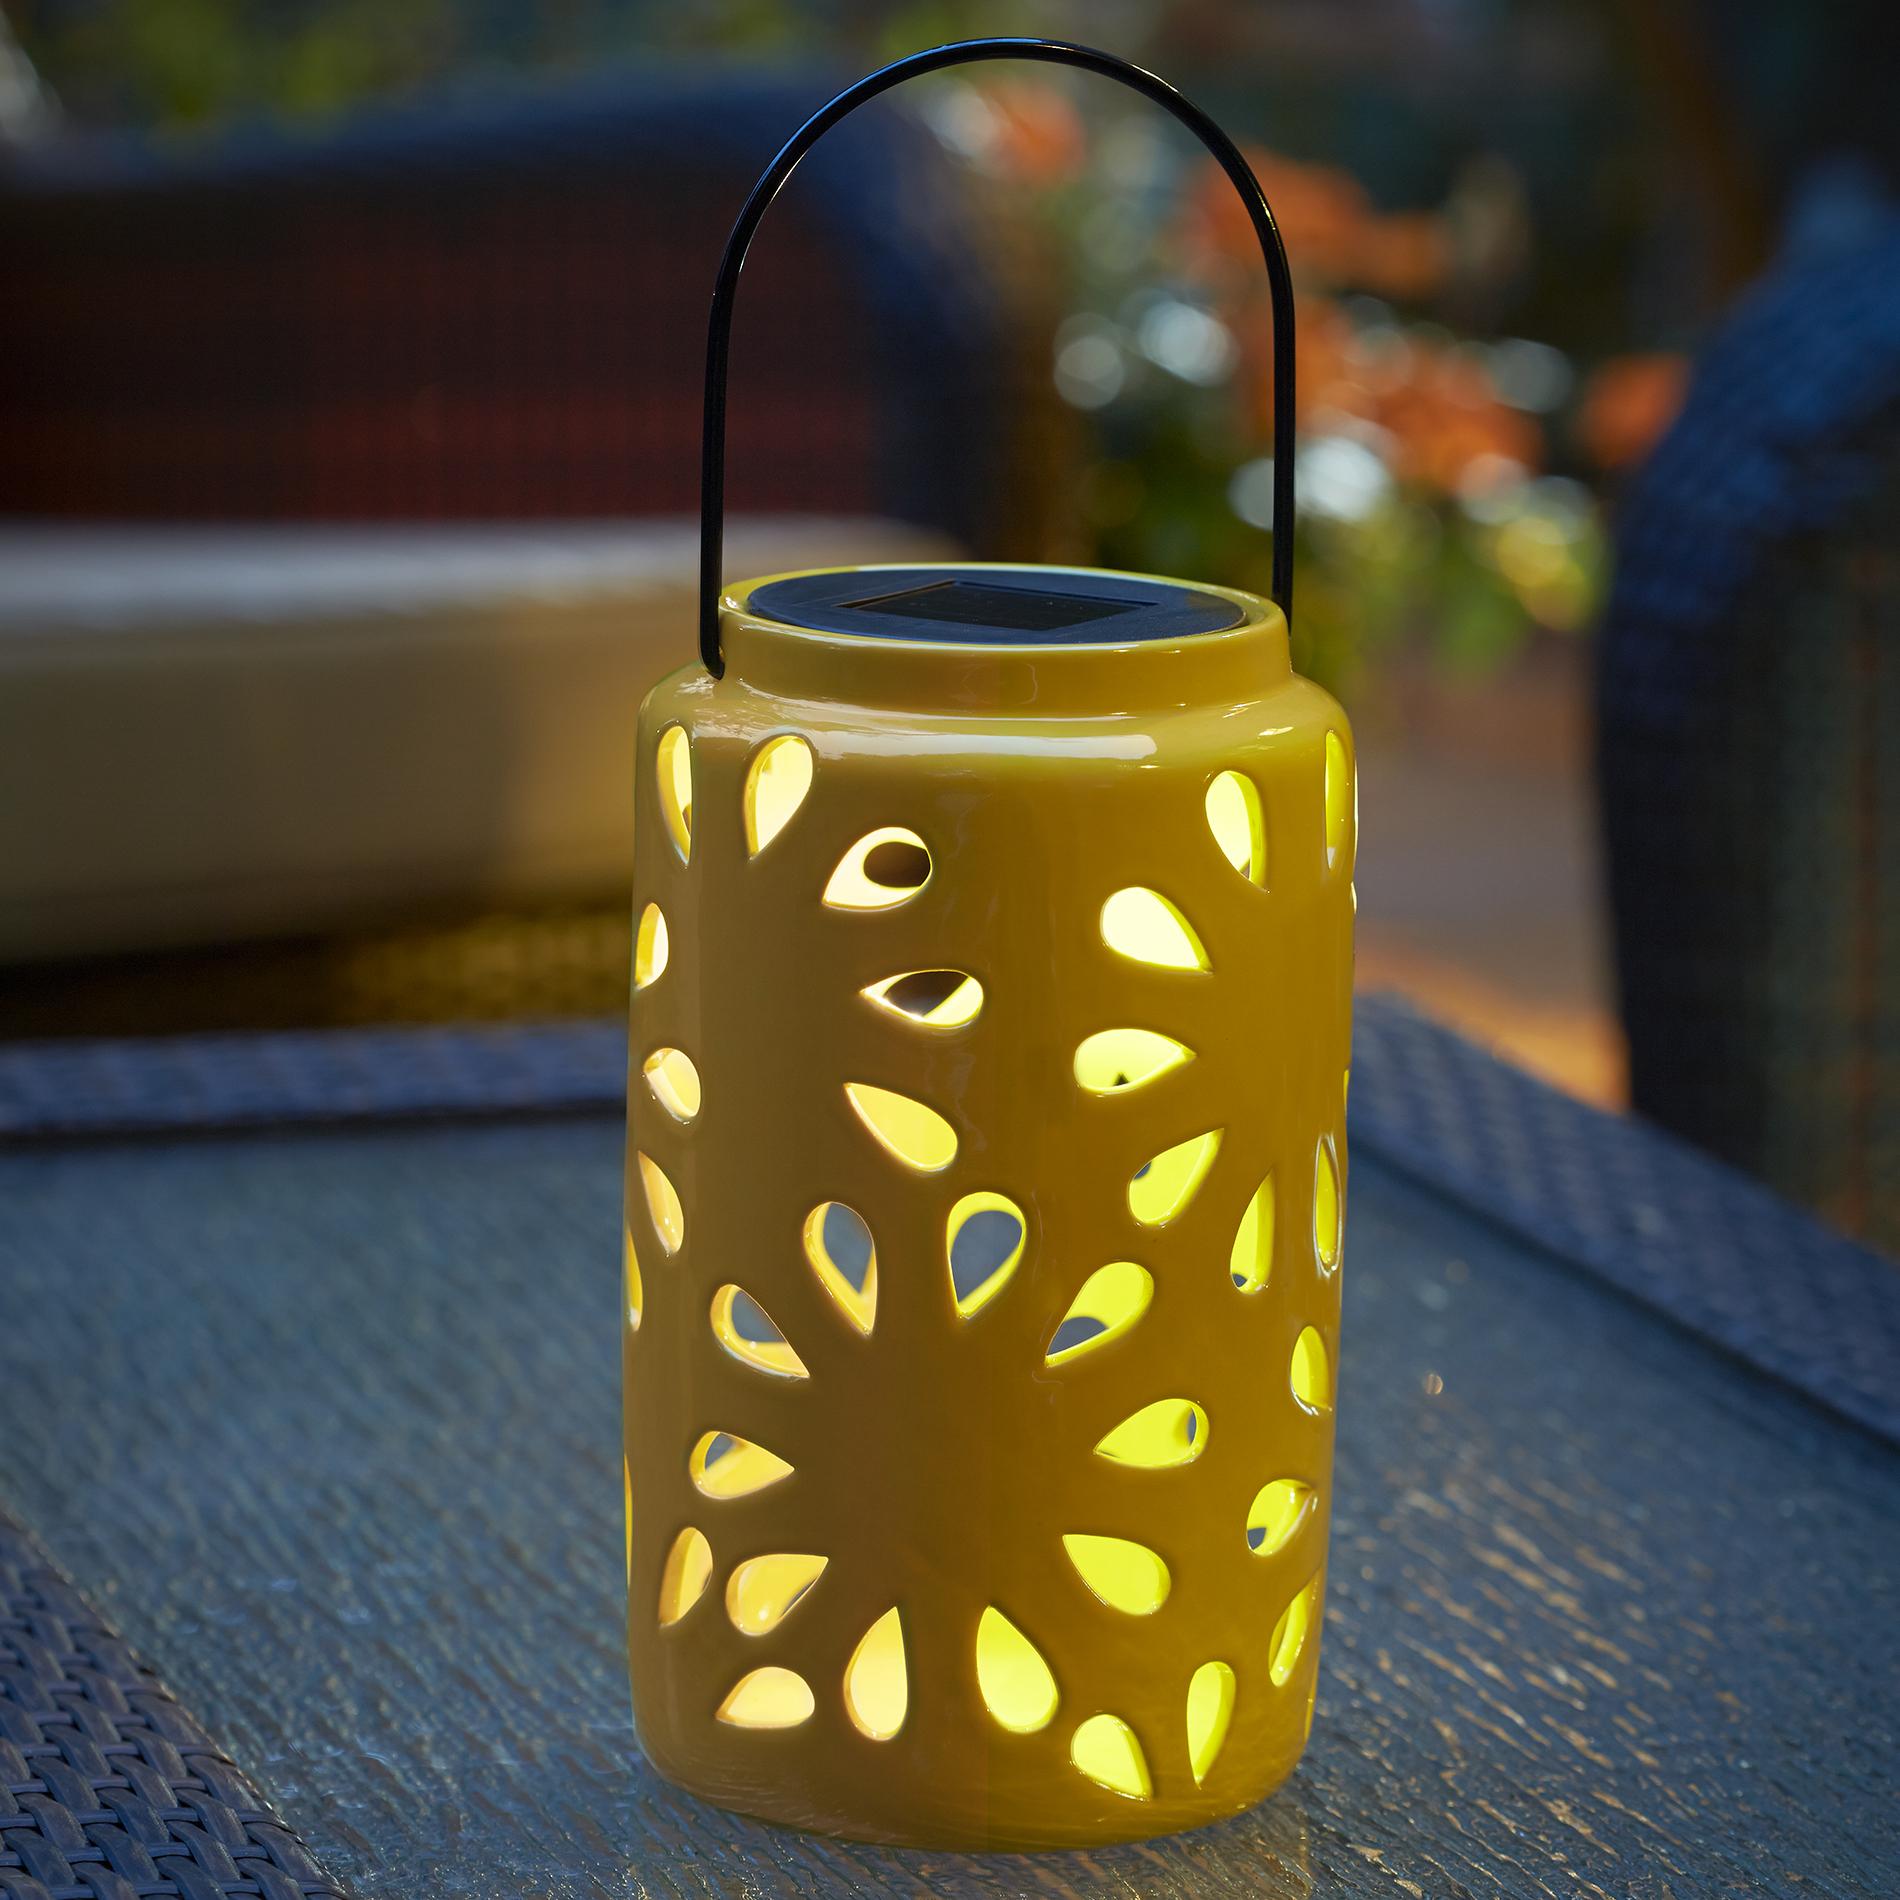 Essential Garden Small Ceramic Lanterns With Solar Light Yellow Outdoor Living Outdoor